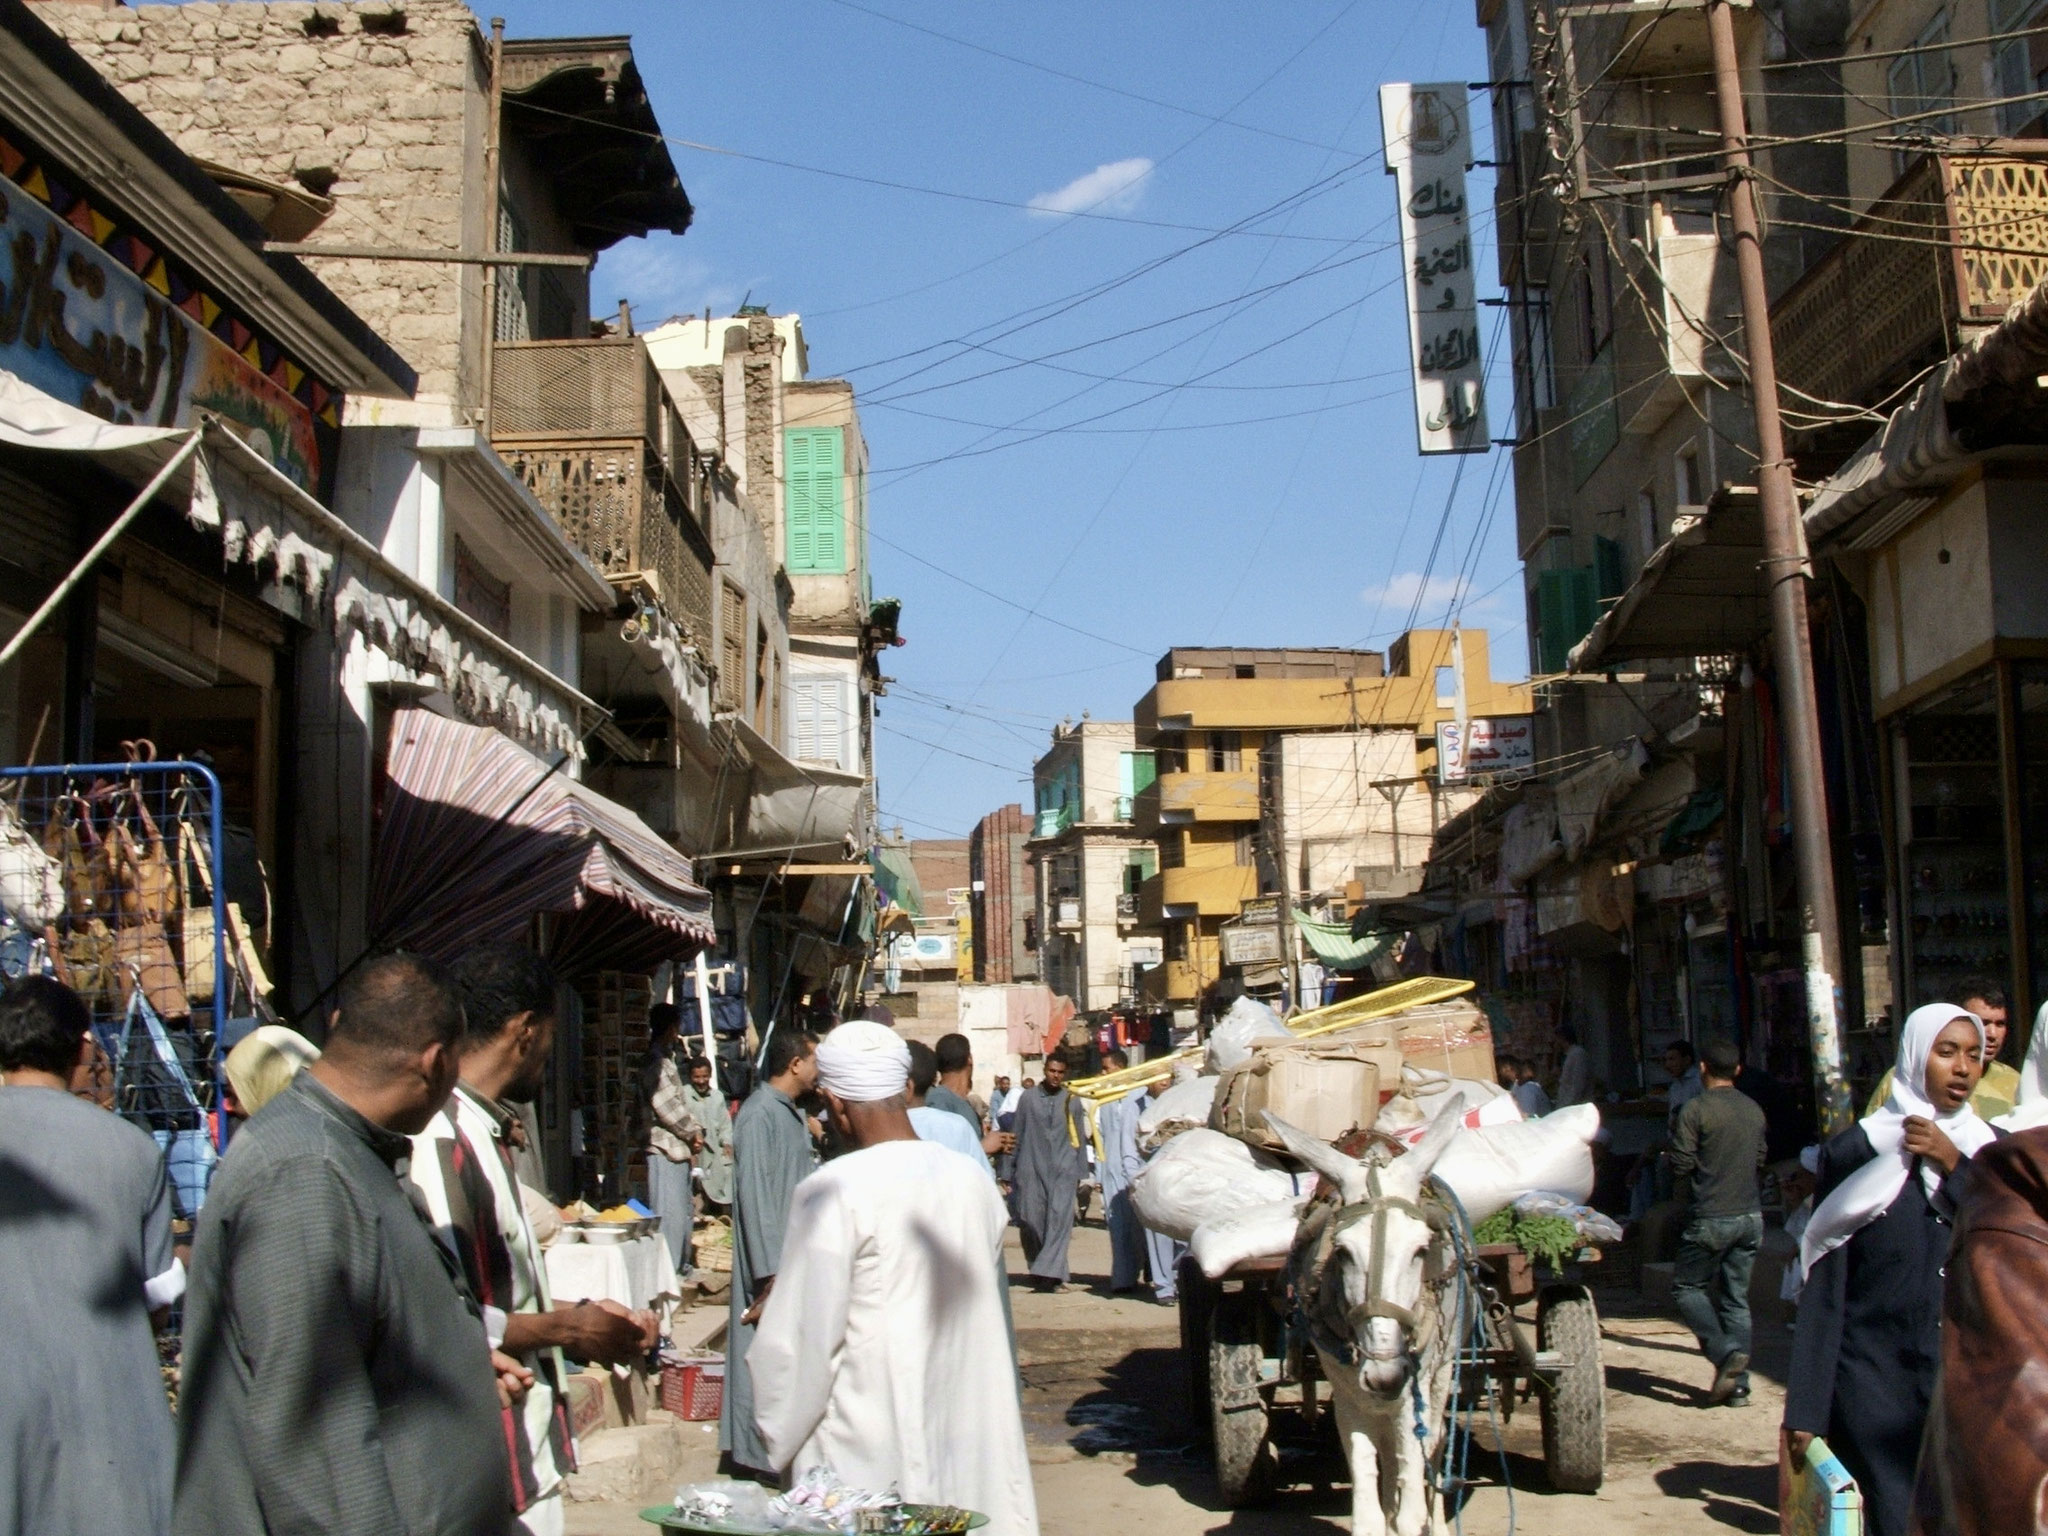 Aswan bustle and laden cart